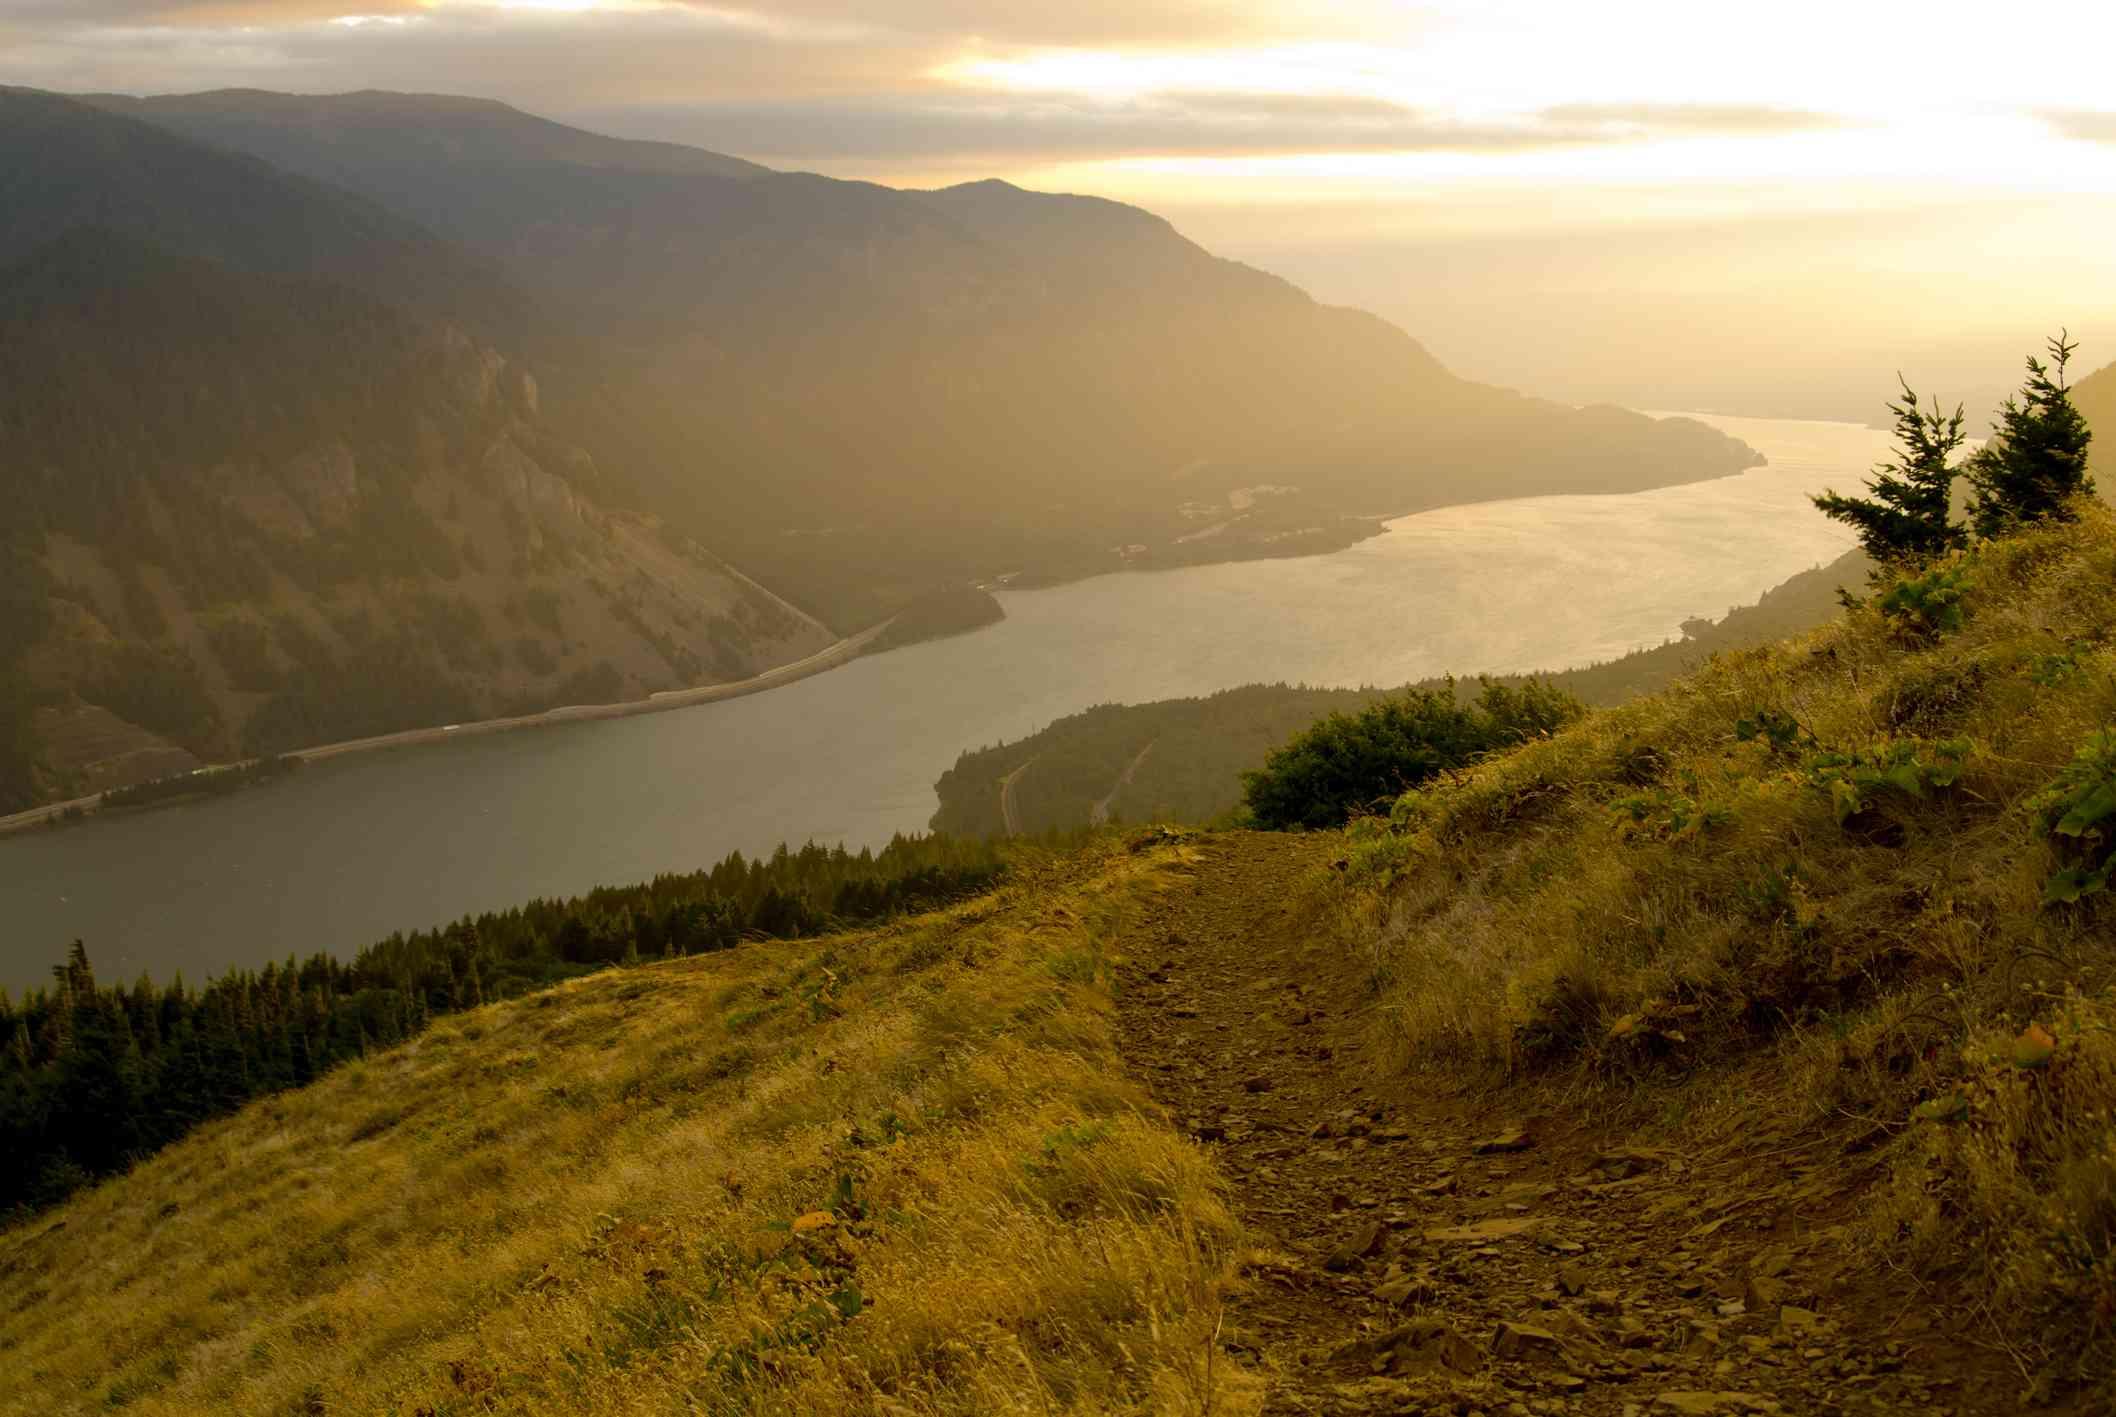 The Dog Mountain Trail descends into the Columbia River Gorge, Washington.